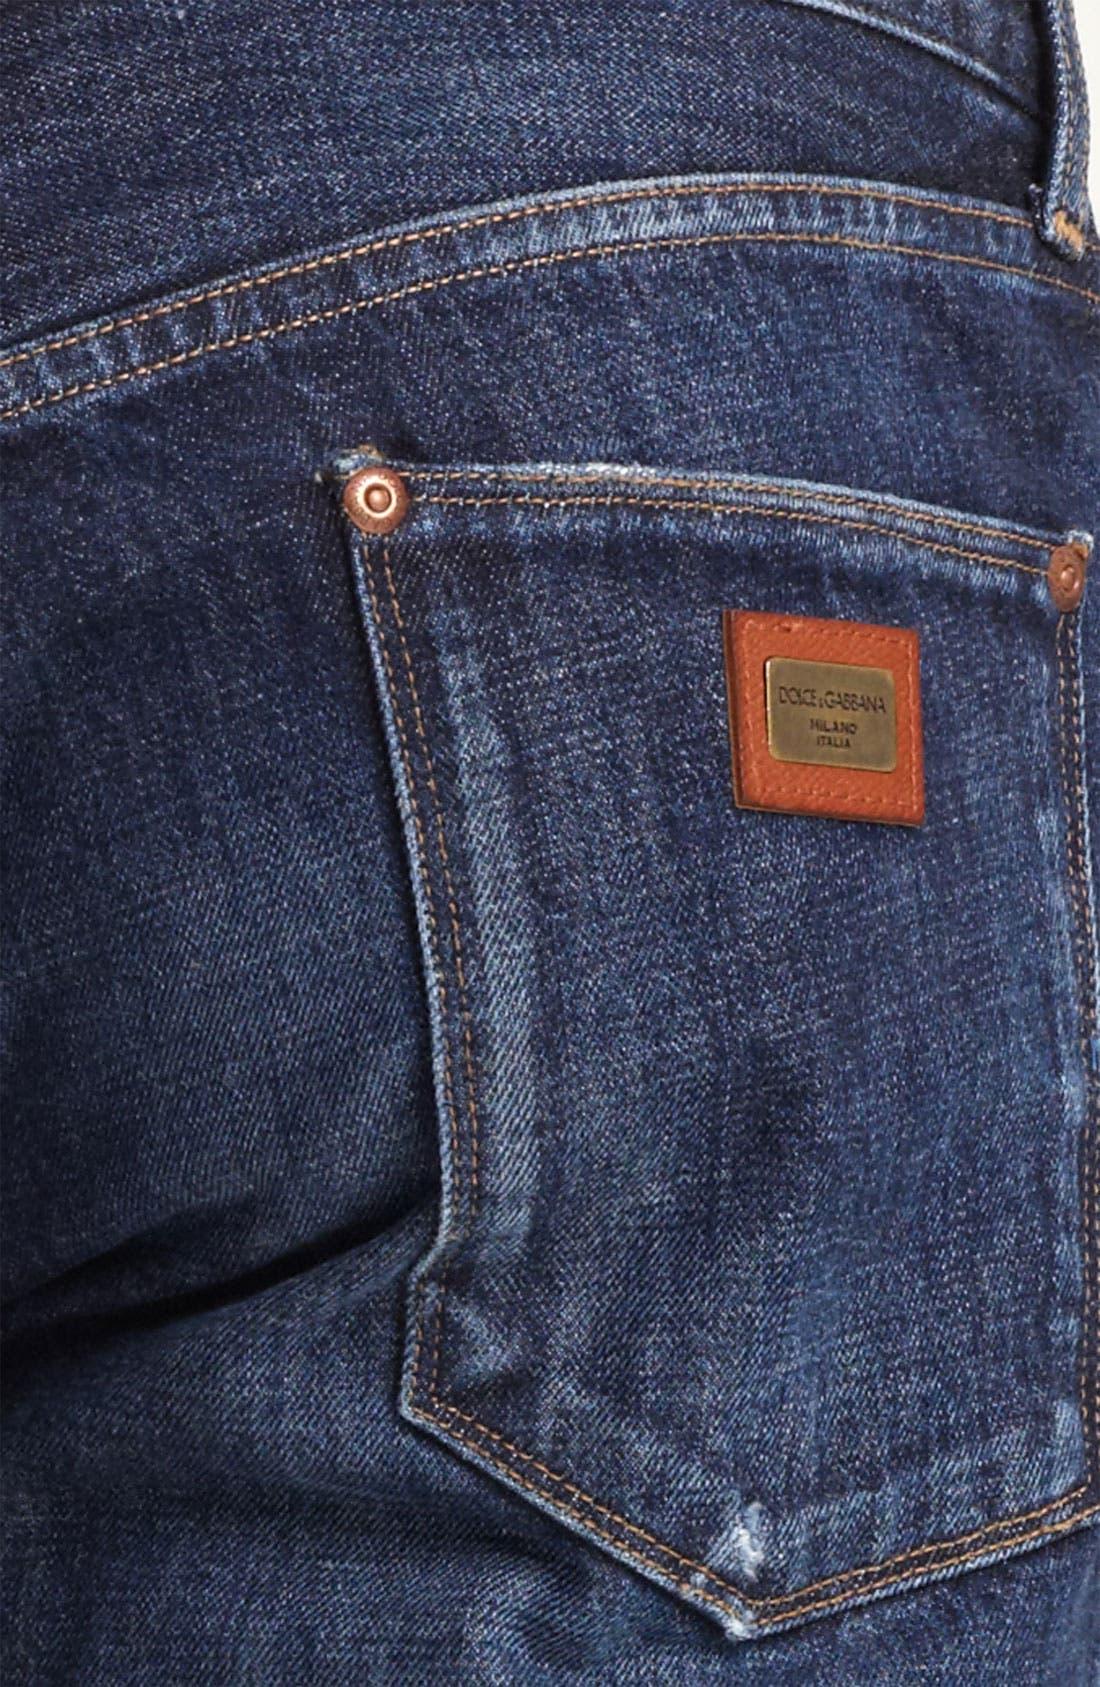 Slim Straight Leg Jeans,                             Alternate thumbnail 4, color,                             401